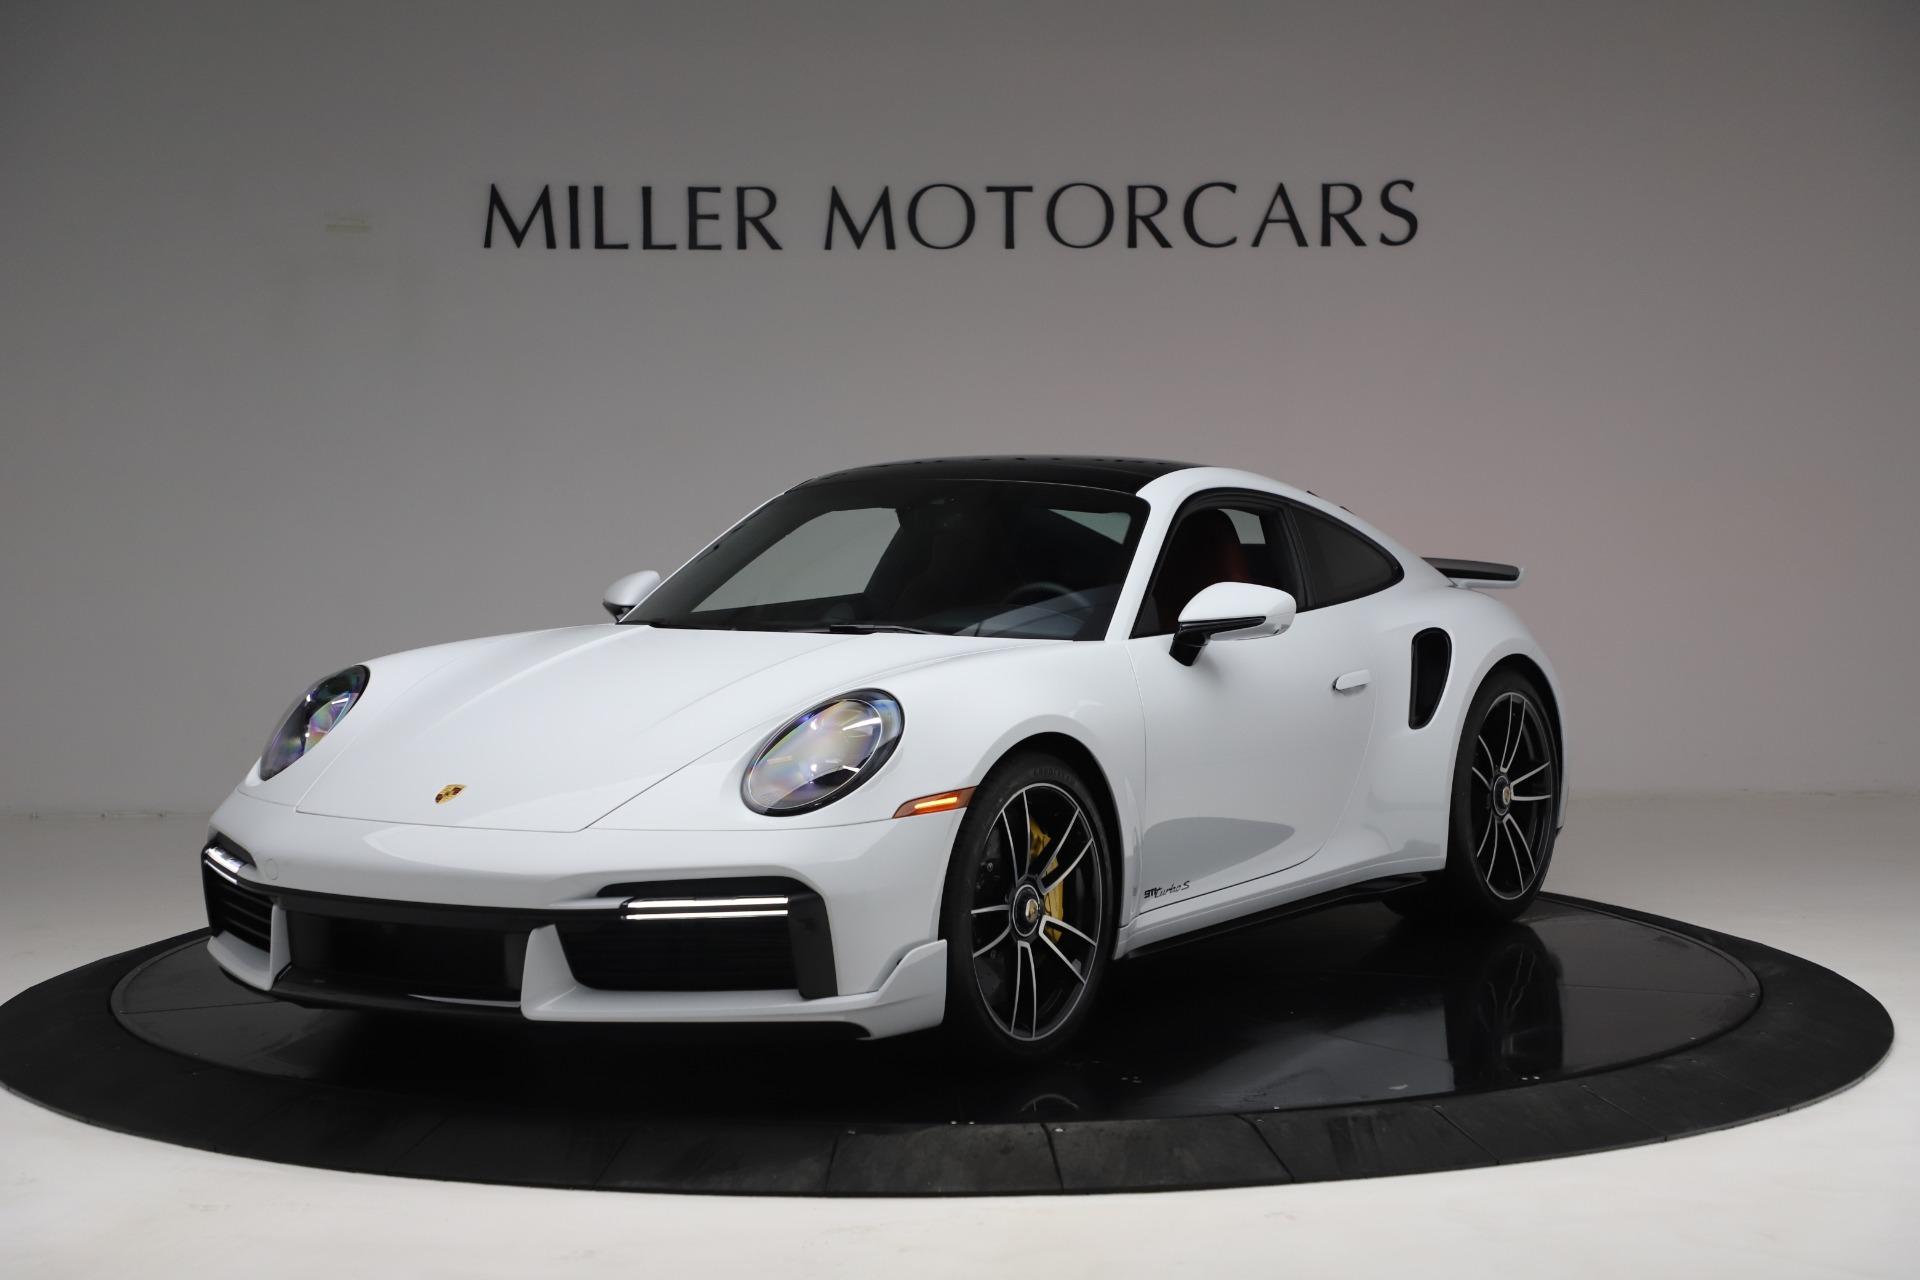 Used 2021 Porsche 911 Turbo S for sale Sold at Alfa Romeo of Westport in Westport CT 06880 1